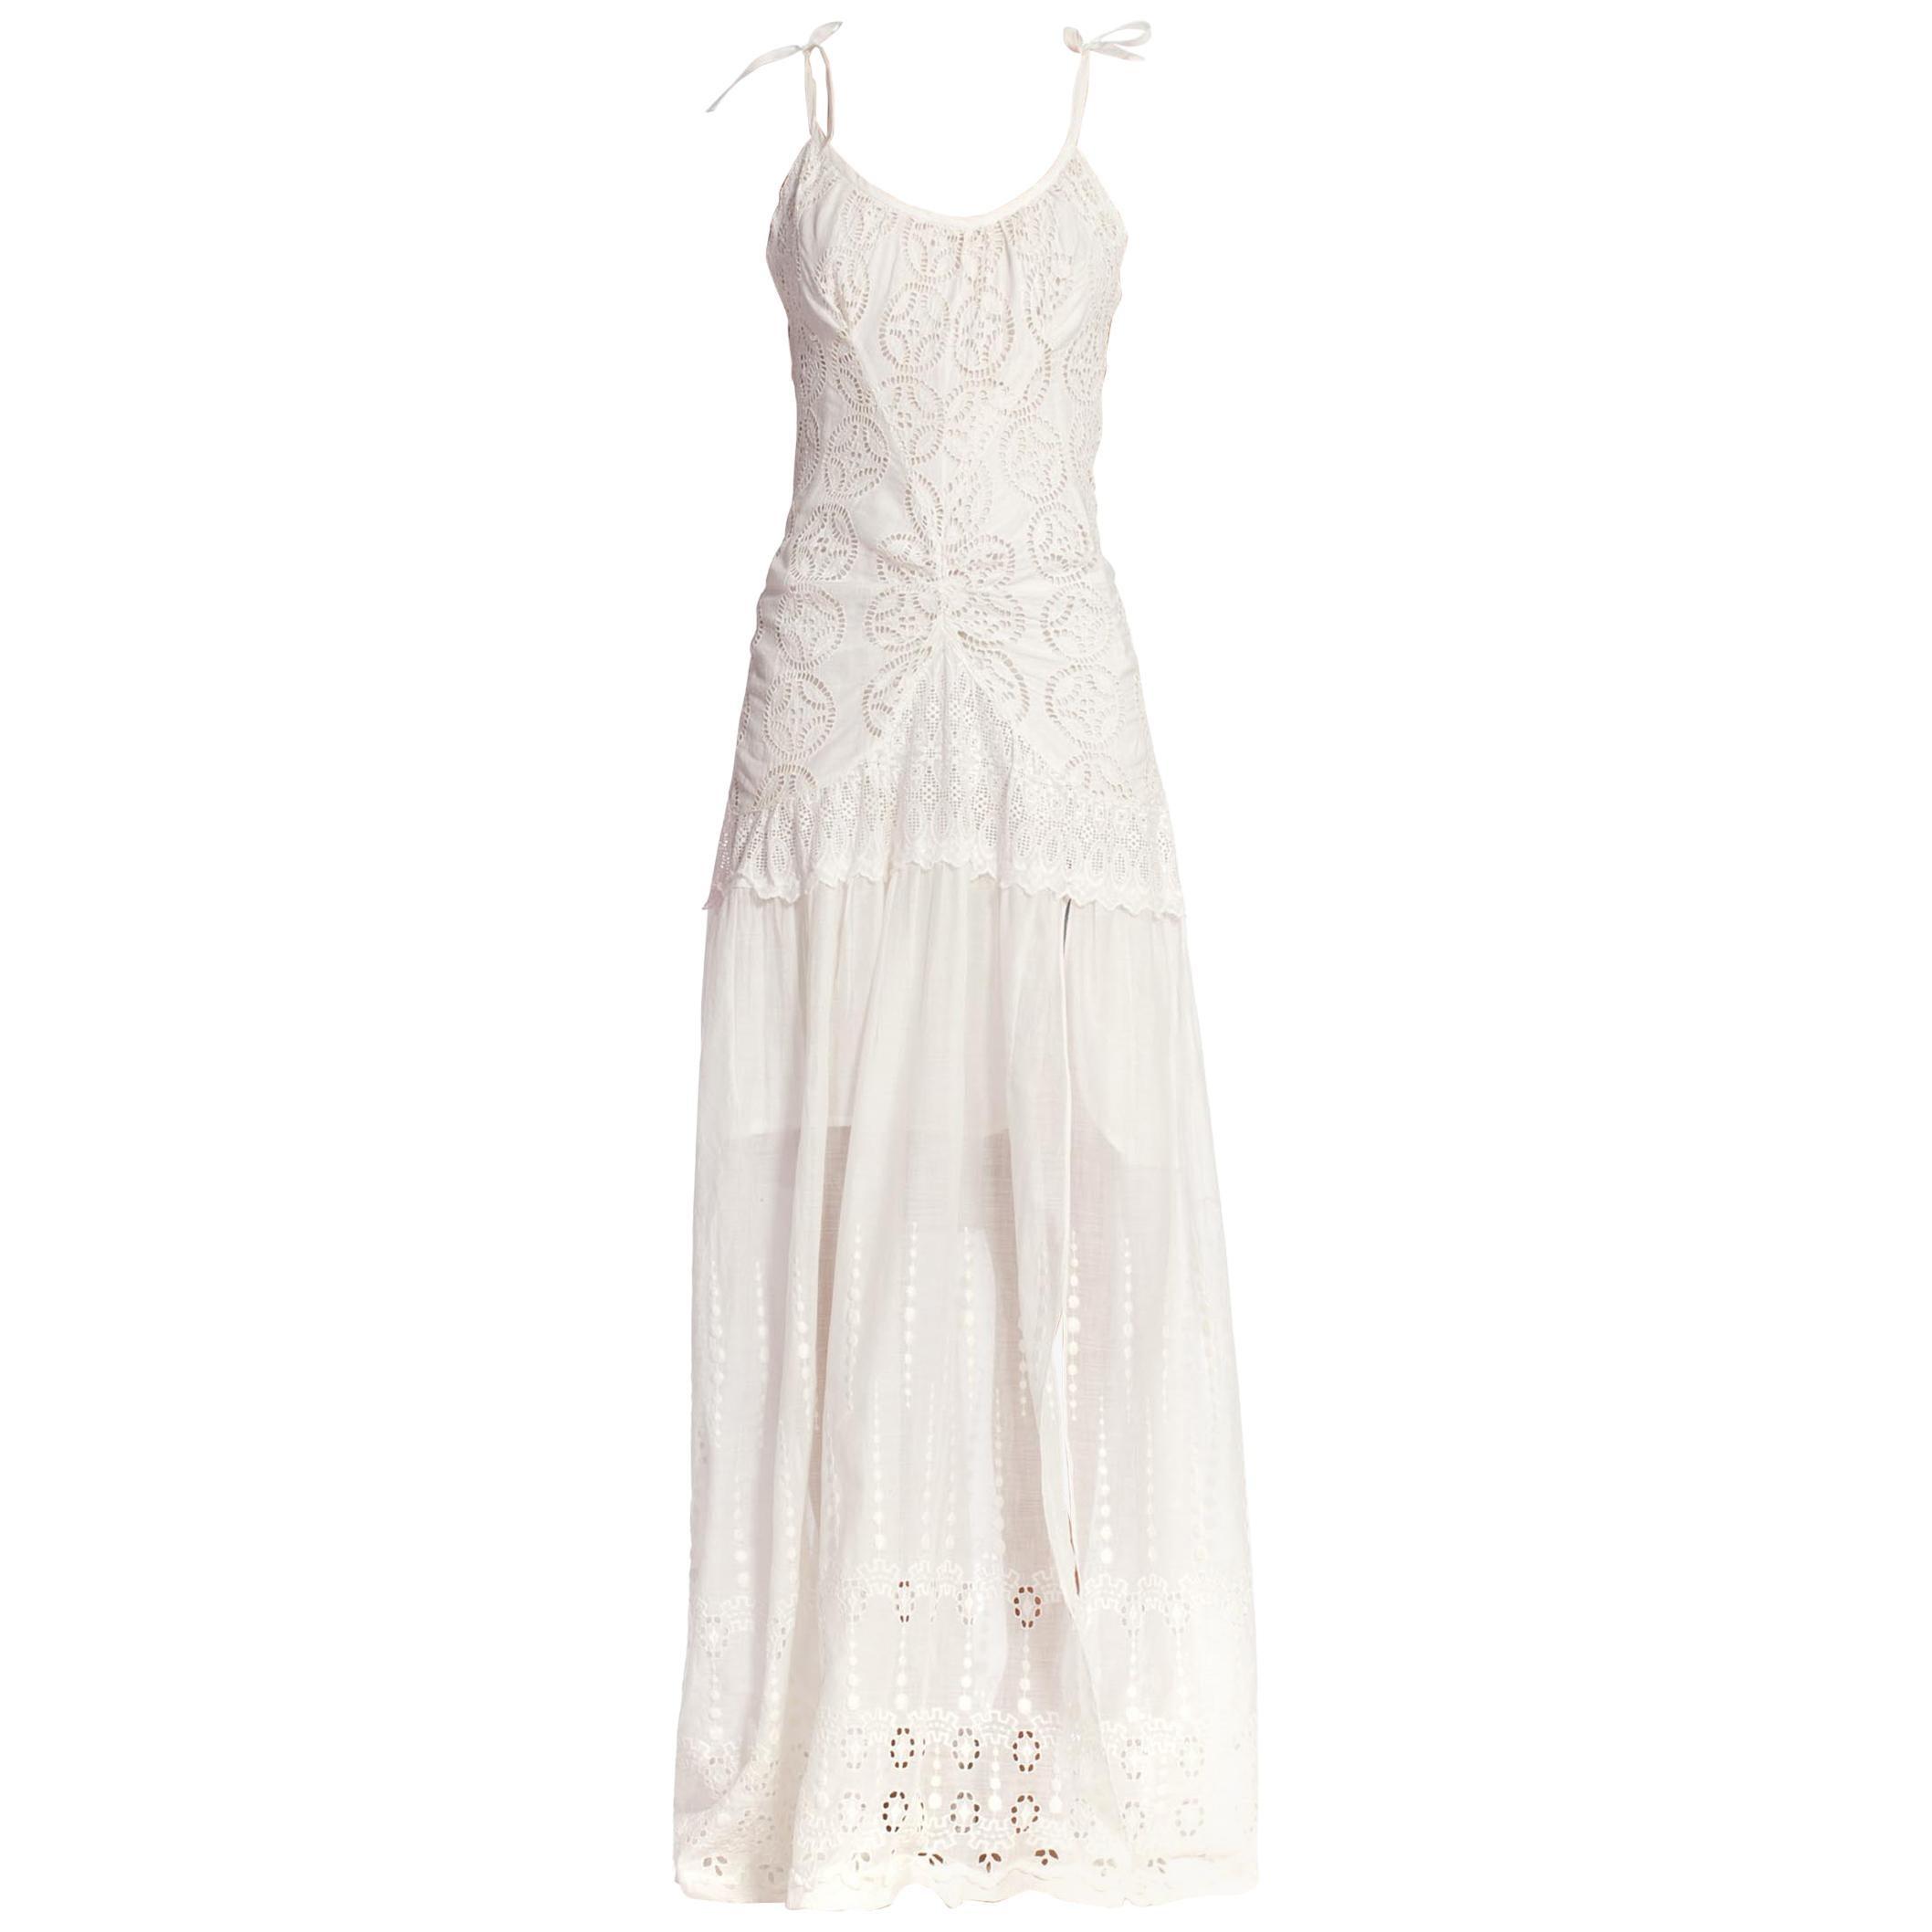 Morphew Collection 1920'S Victorian Cotton Lace Dress